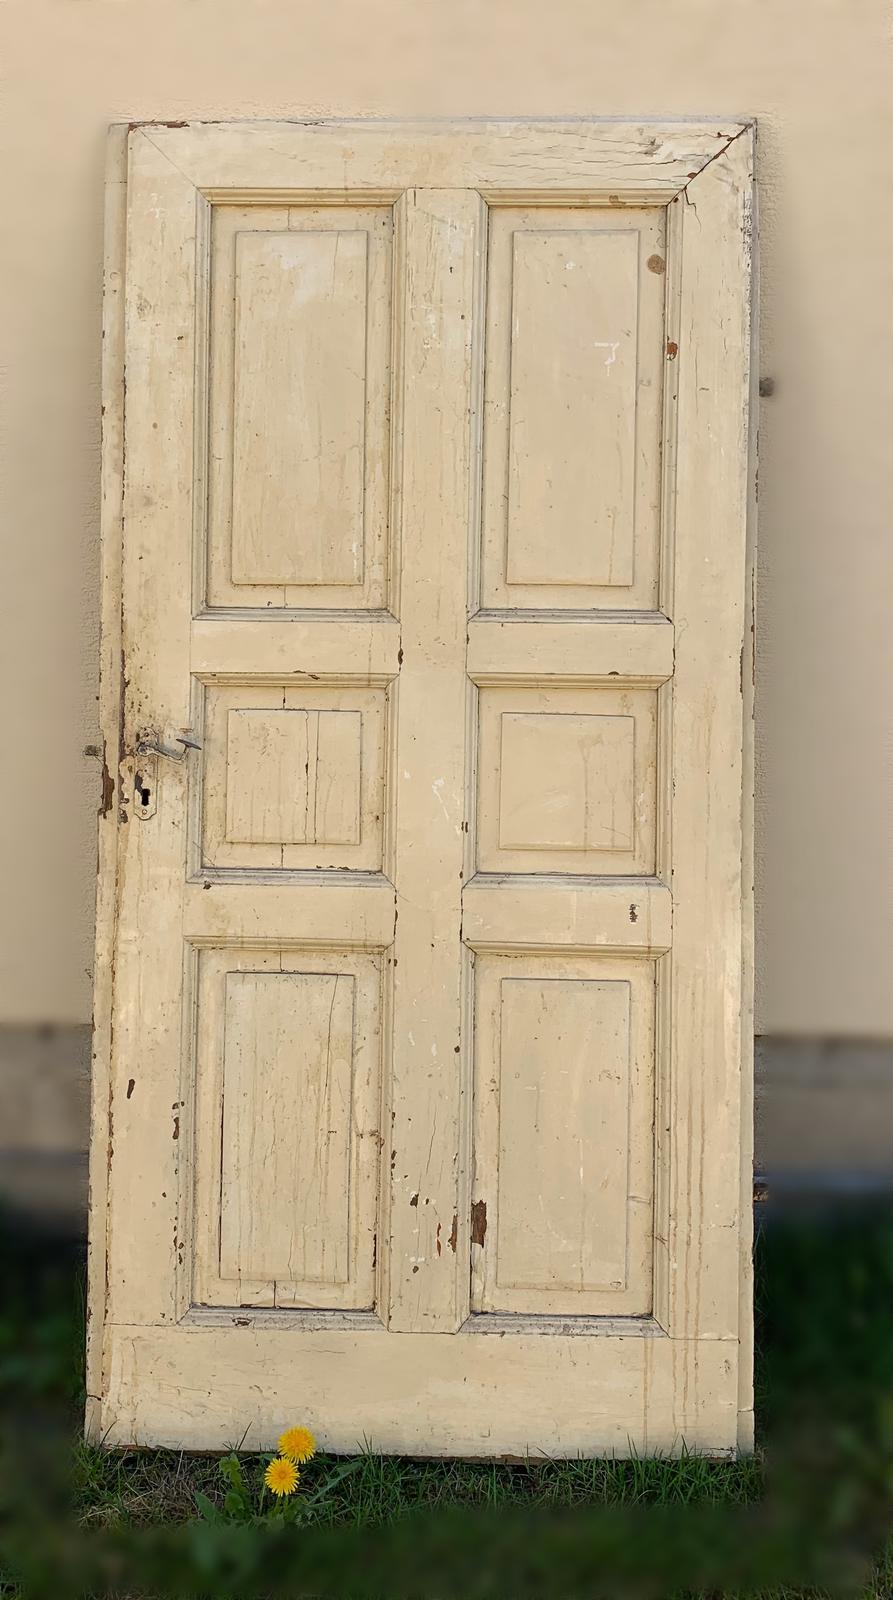 Starozitne dvere  - Obrázok č. 1